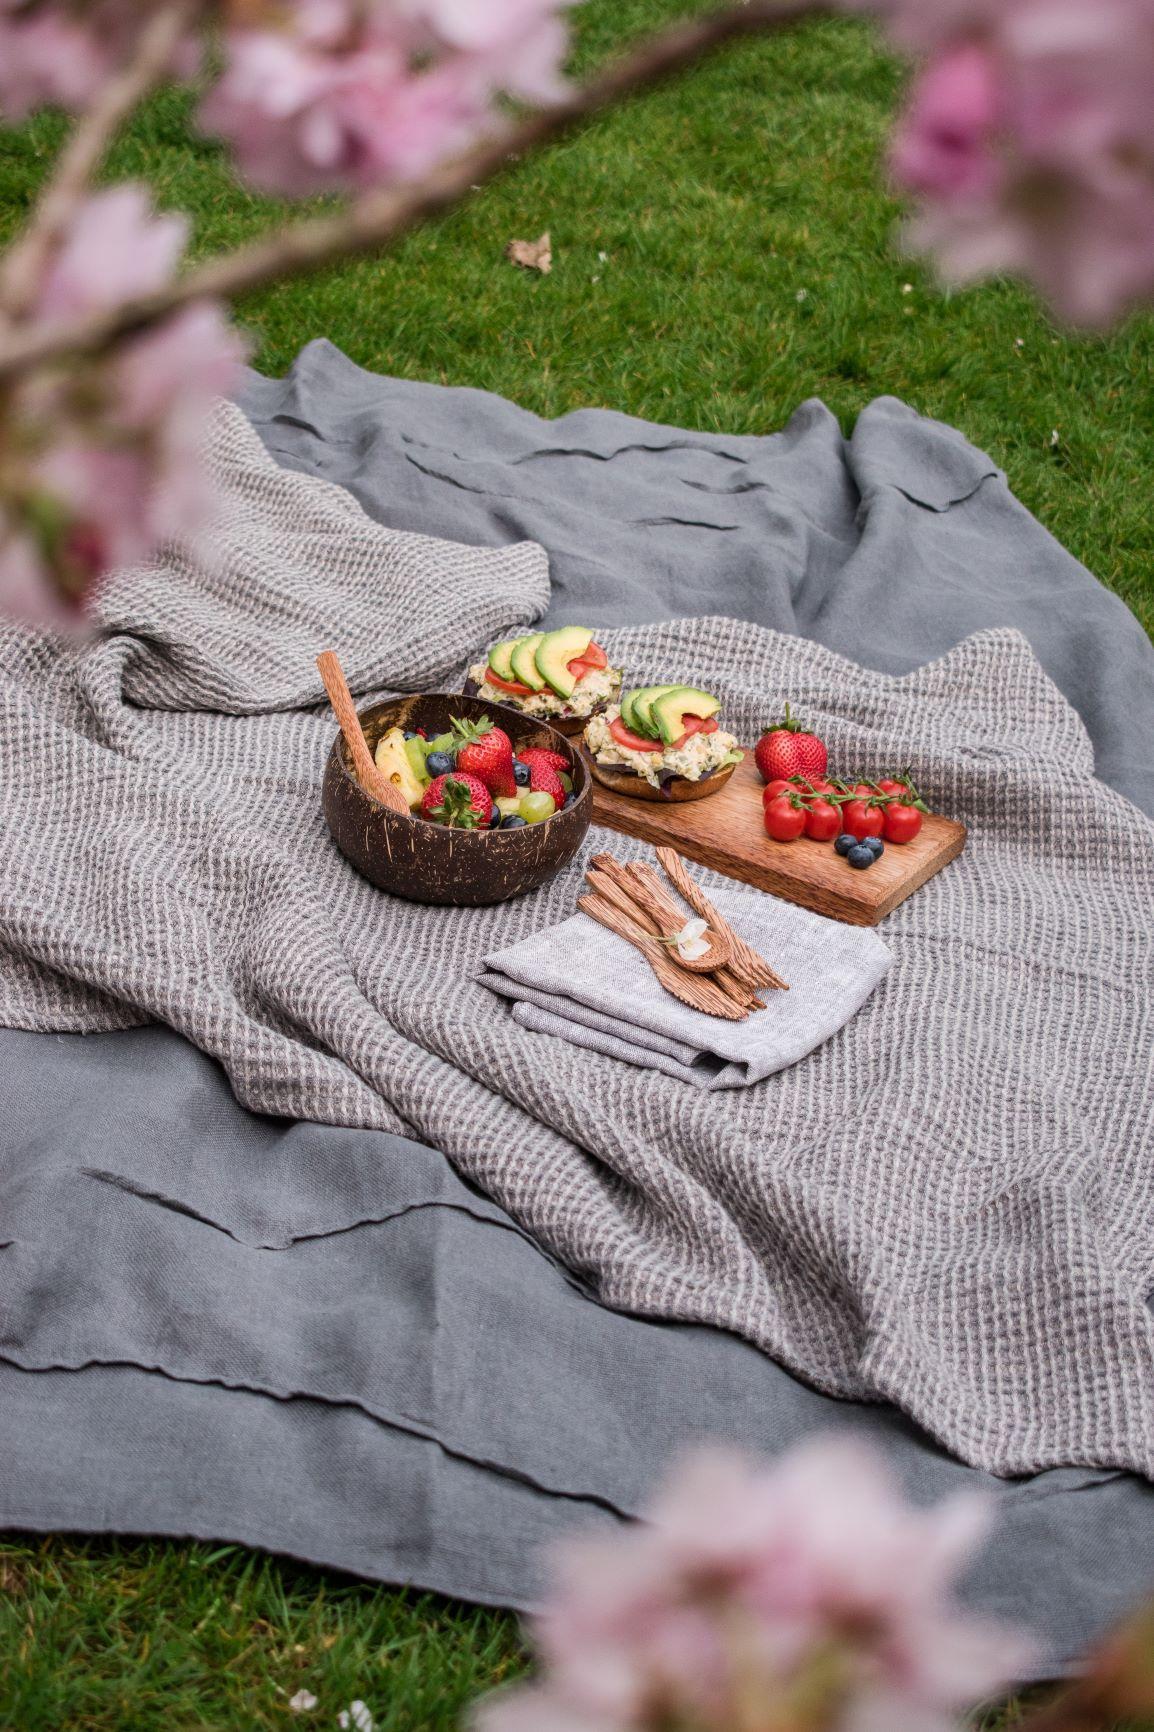 Food on a warm blanket